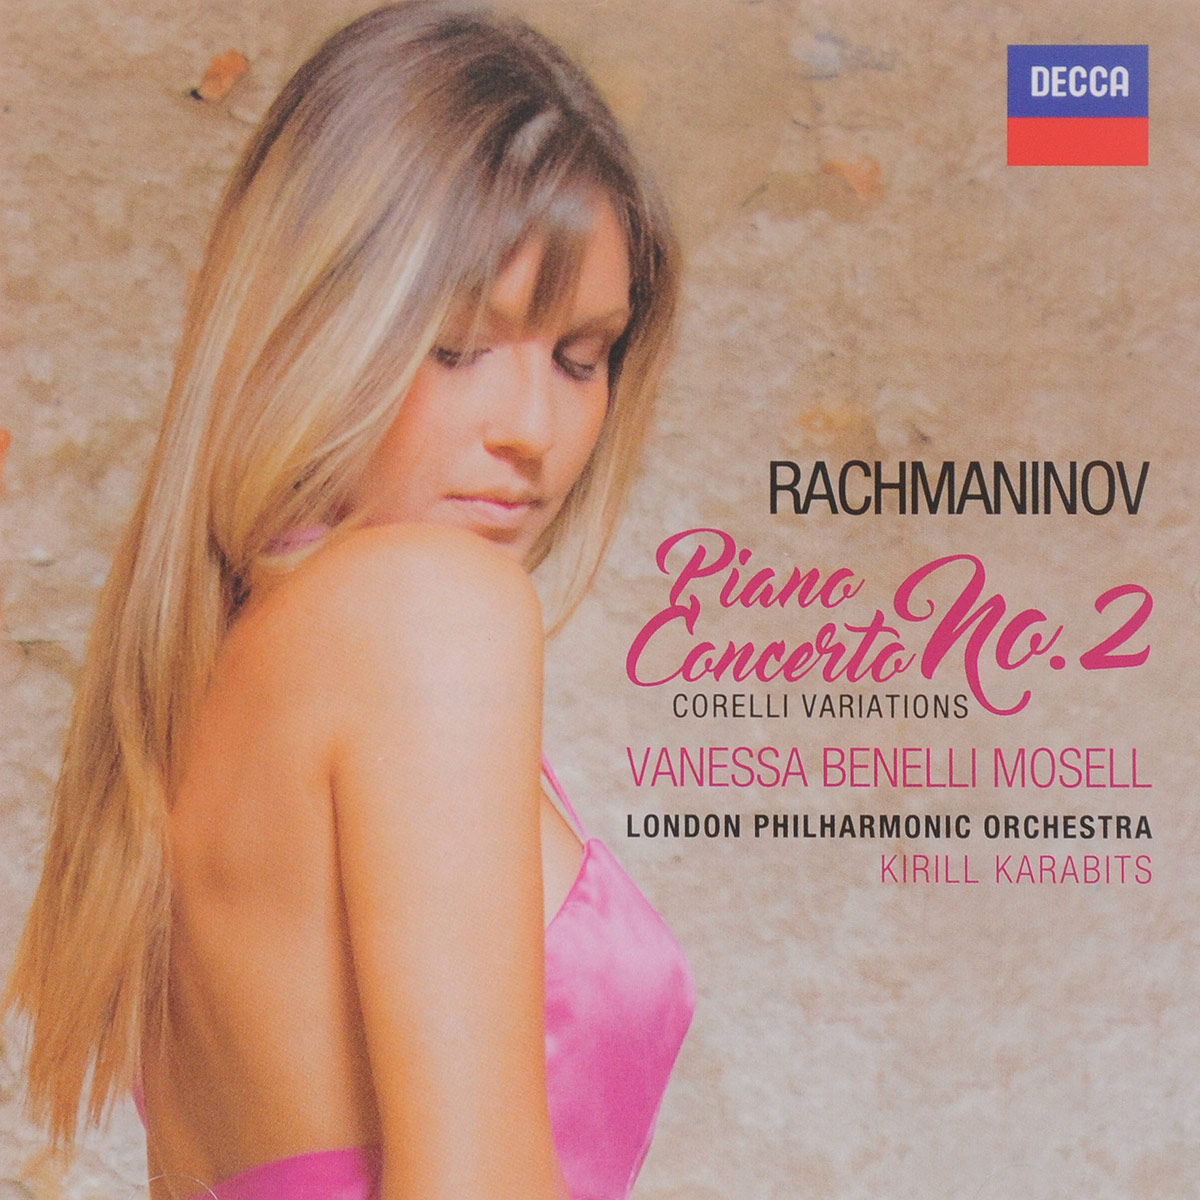 Vanessa Benelli Mosell,London Philharmonic Orchestra,Кирилл Карабитс Vanessa Benelli Mosell. Rachmaninov. Piano Concerto No. 2